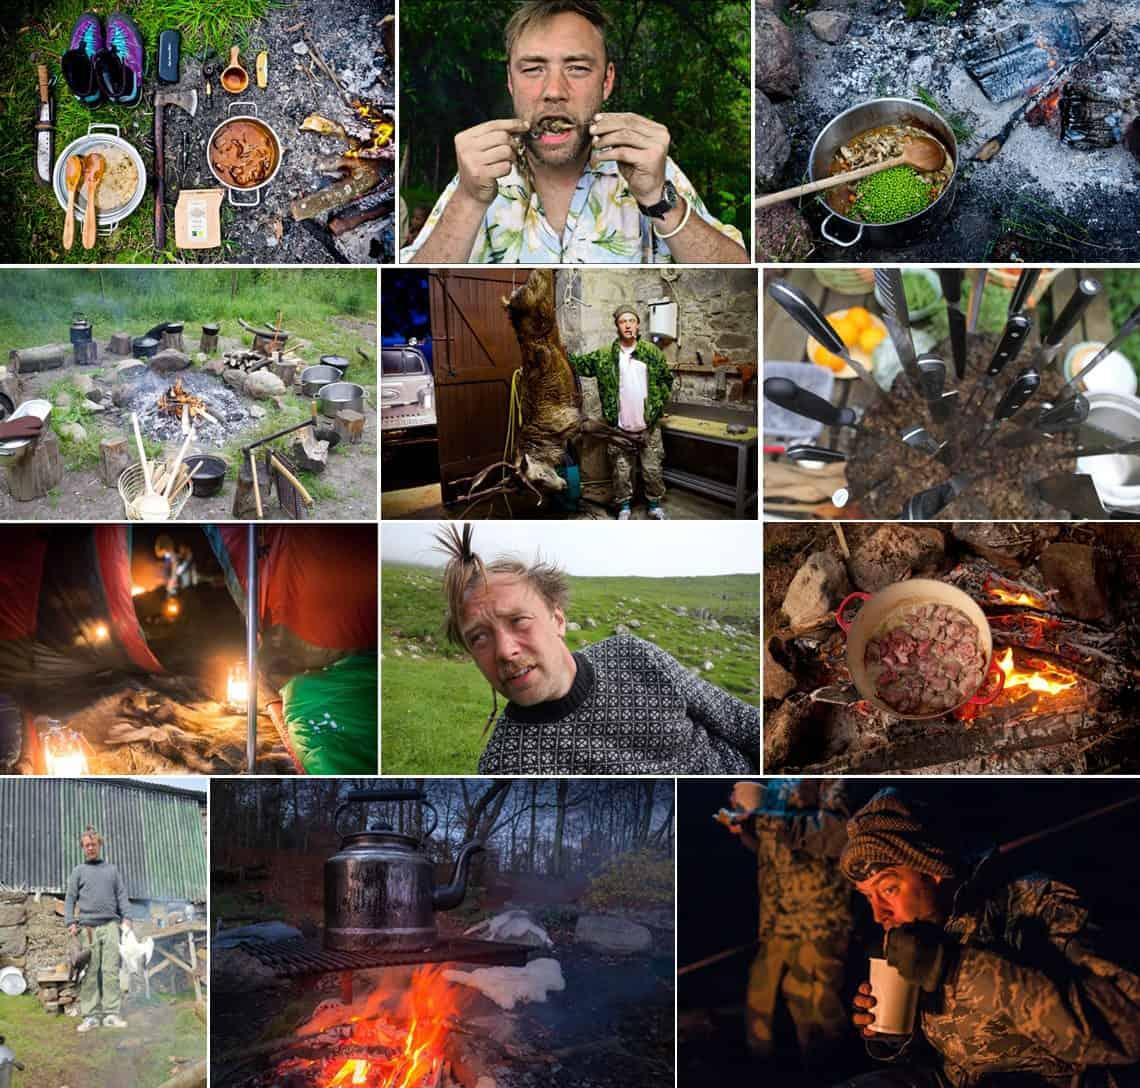 [Podcasts] Komud – Friluftsnørderi, Mad på tur, med Nikolaj Kirk